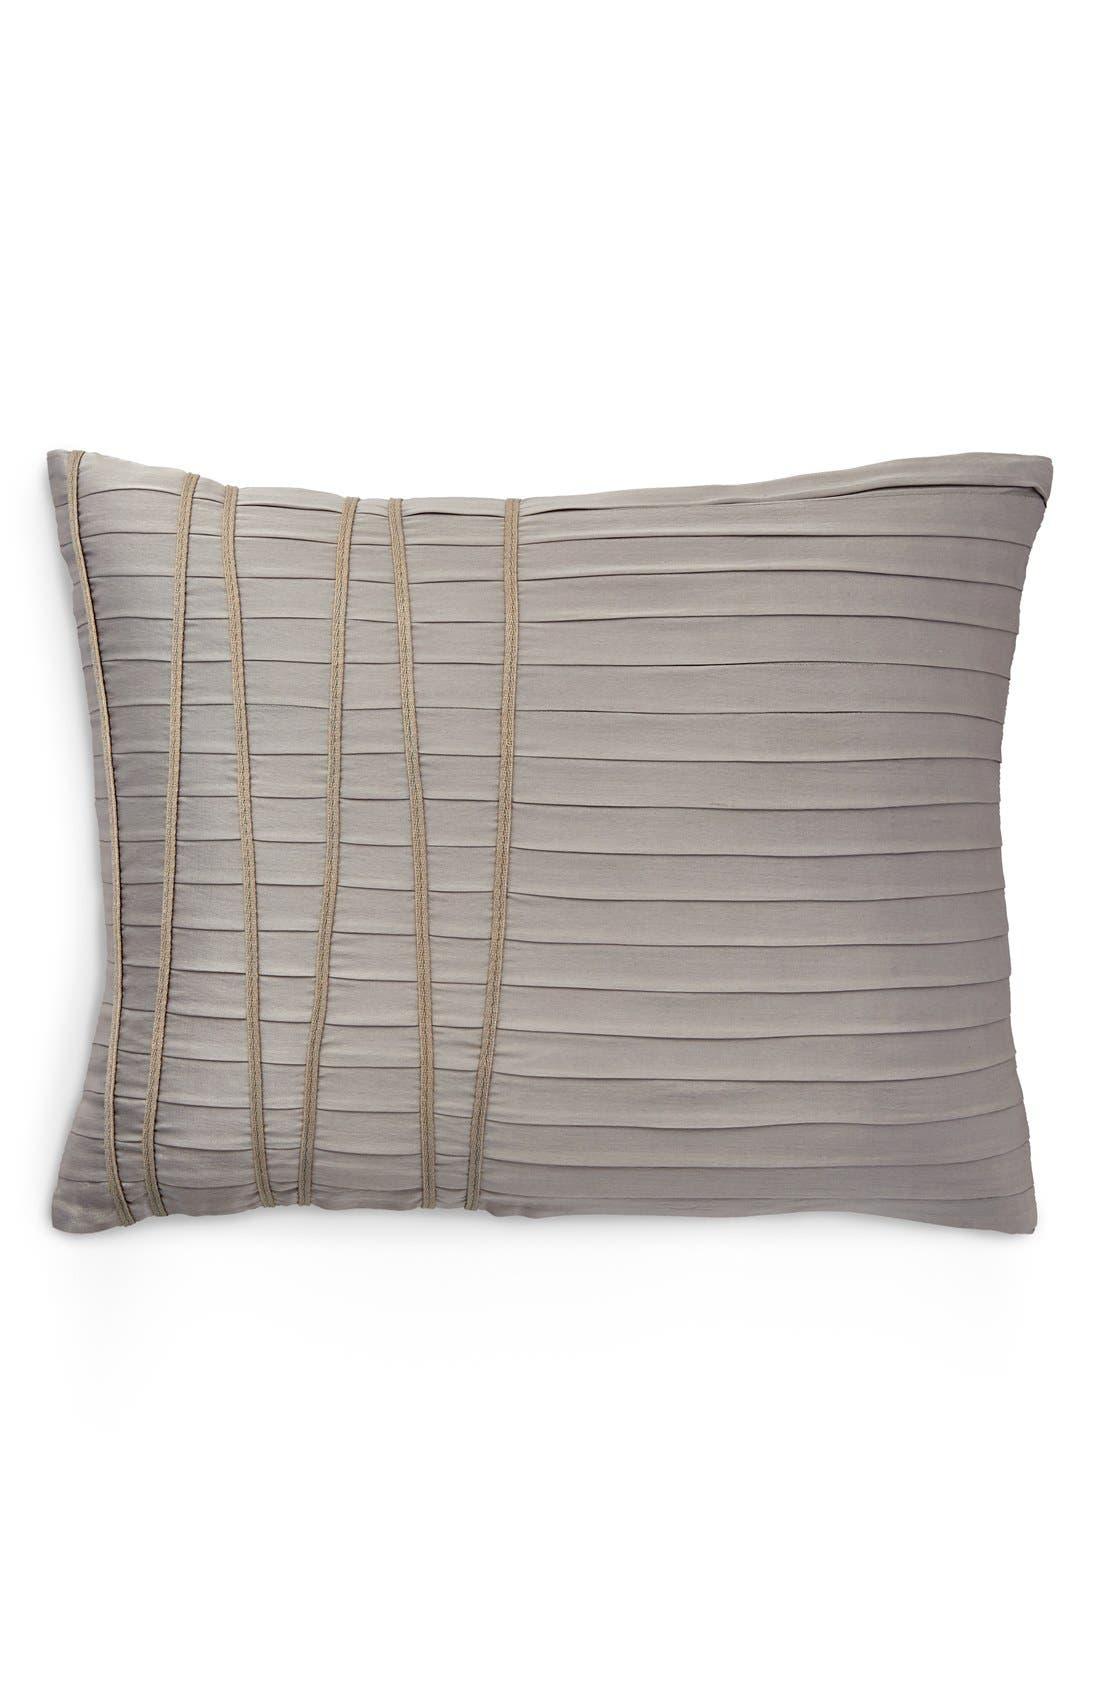 DONNA KARAN NEW YORK Donna Karan Collection 'Reflection' Accent Pillow, Main, color, SILVER